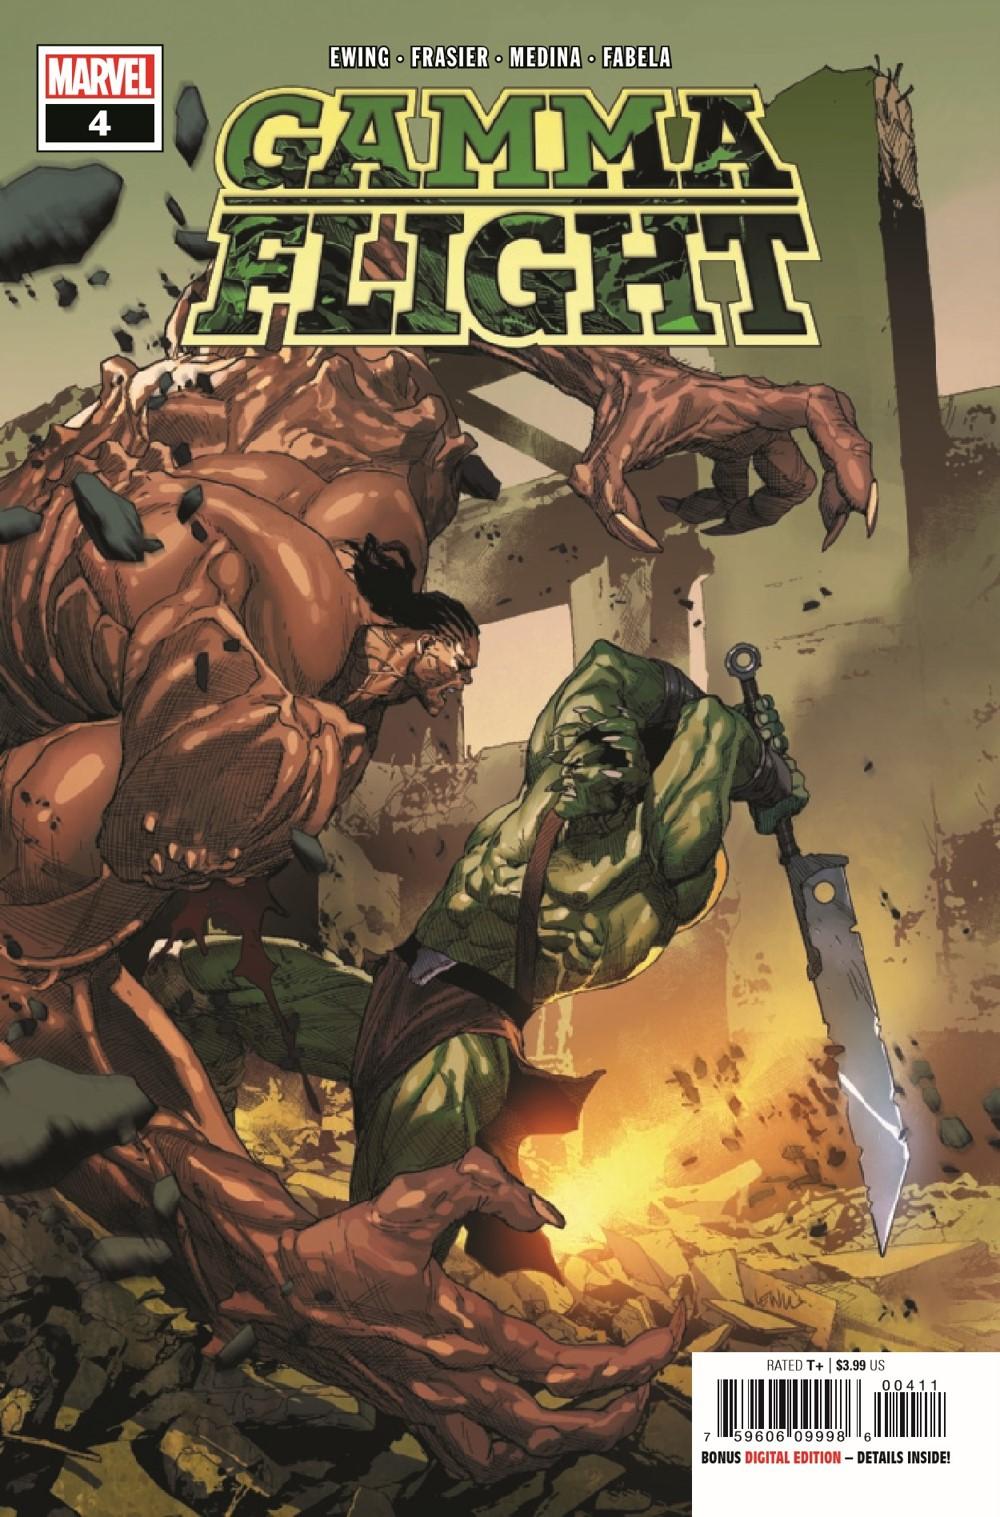 GAMMAF2021004_Preview-1 ComicList Previews: GAMMA FLIGHT #4 (OF 5)